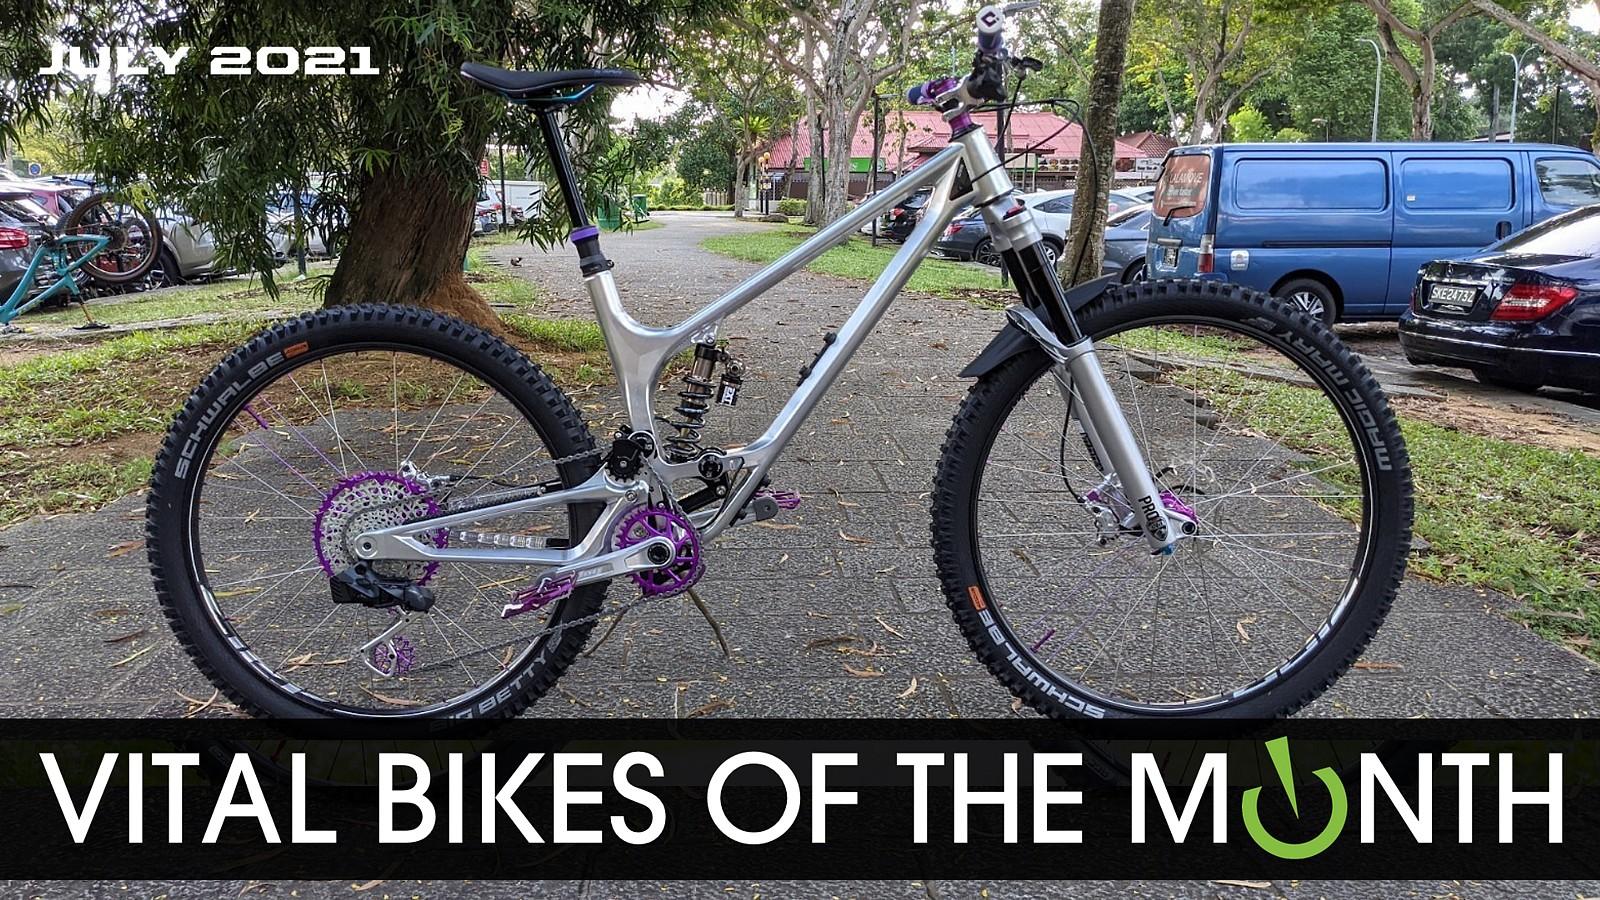 Vital Bikes of the Month, July 2021 - Vital Bike of the Day July 2021 - Mountain Biking Pictures - Vital MTB